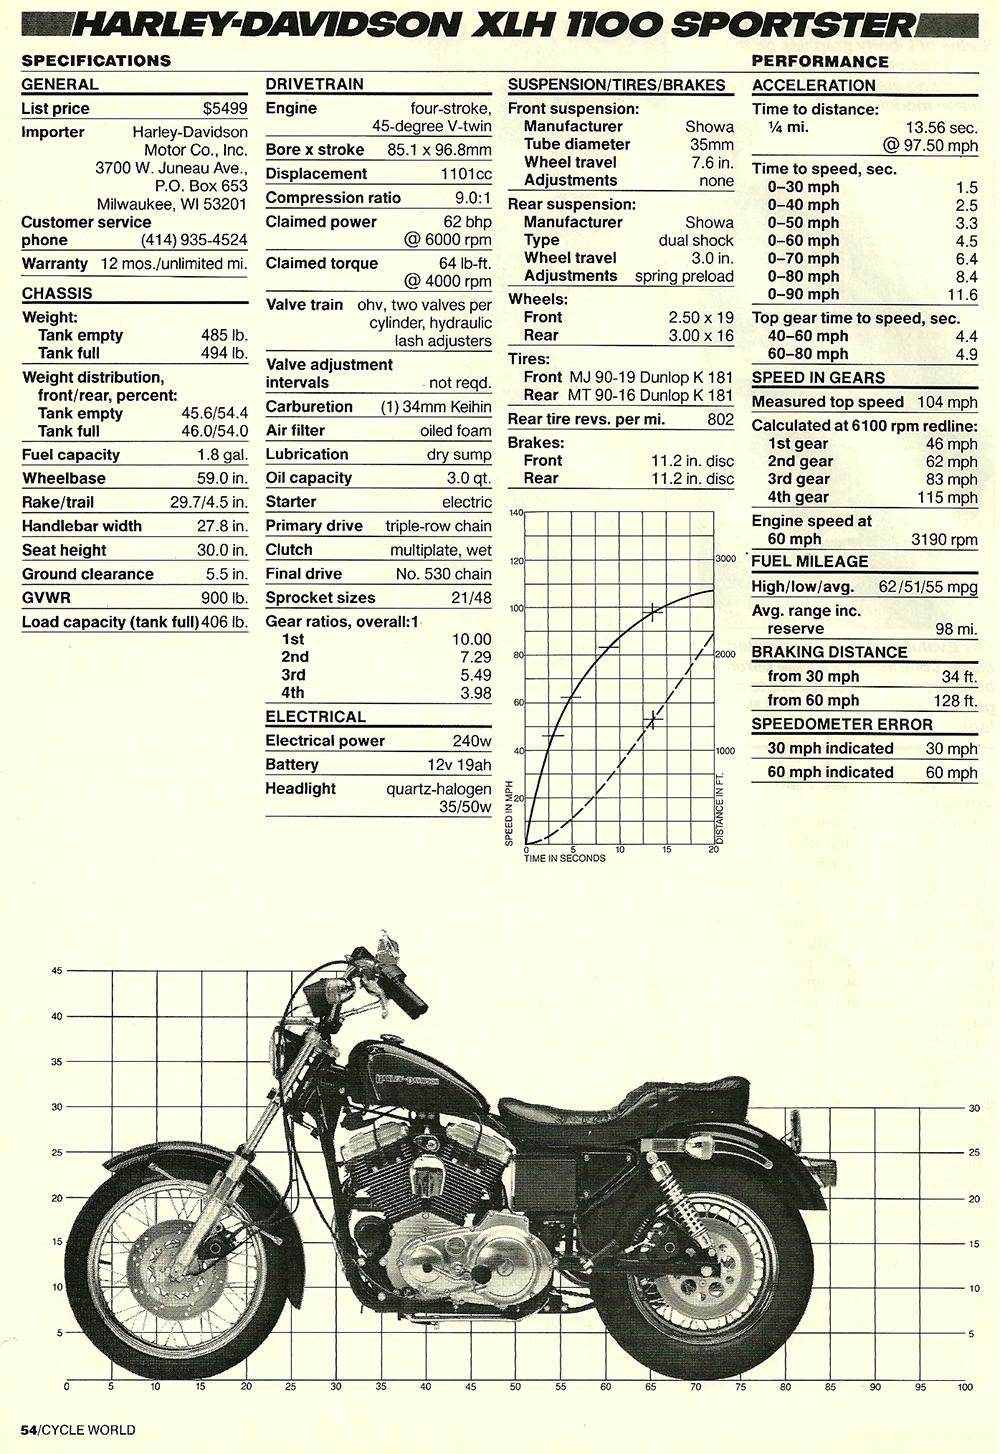 1985 Harley Davidson XLH 1100 Sportster road test 05.jpg